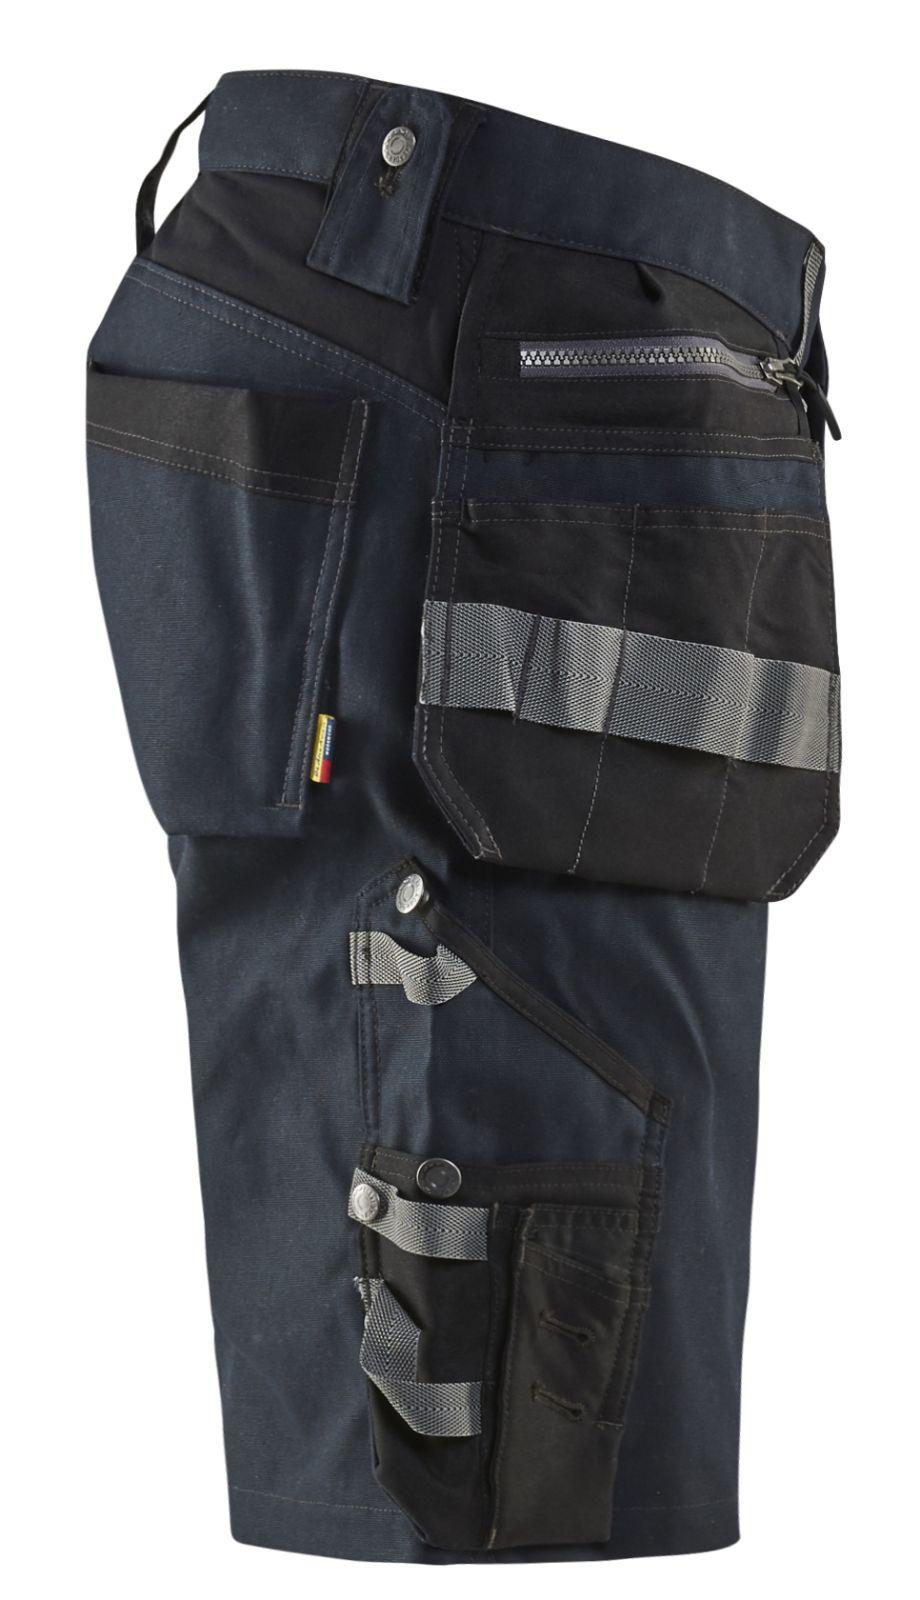 Blaklader Broeken 15981343 donker marineblauw-zwart(8699)